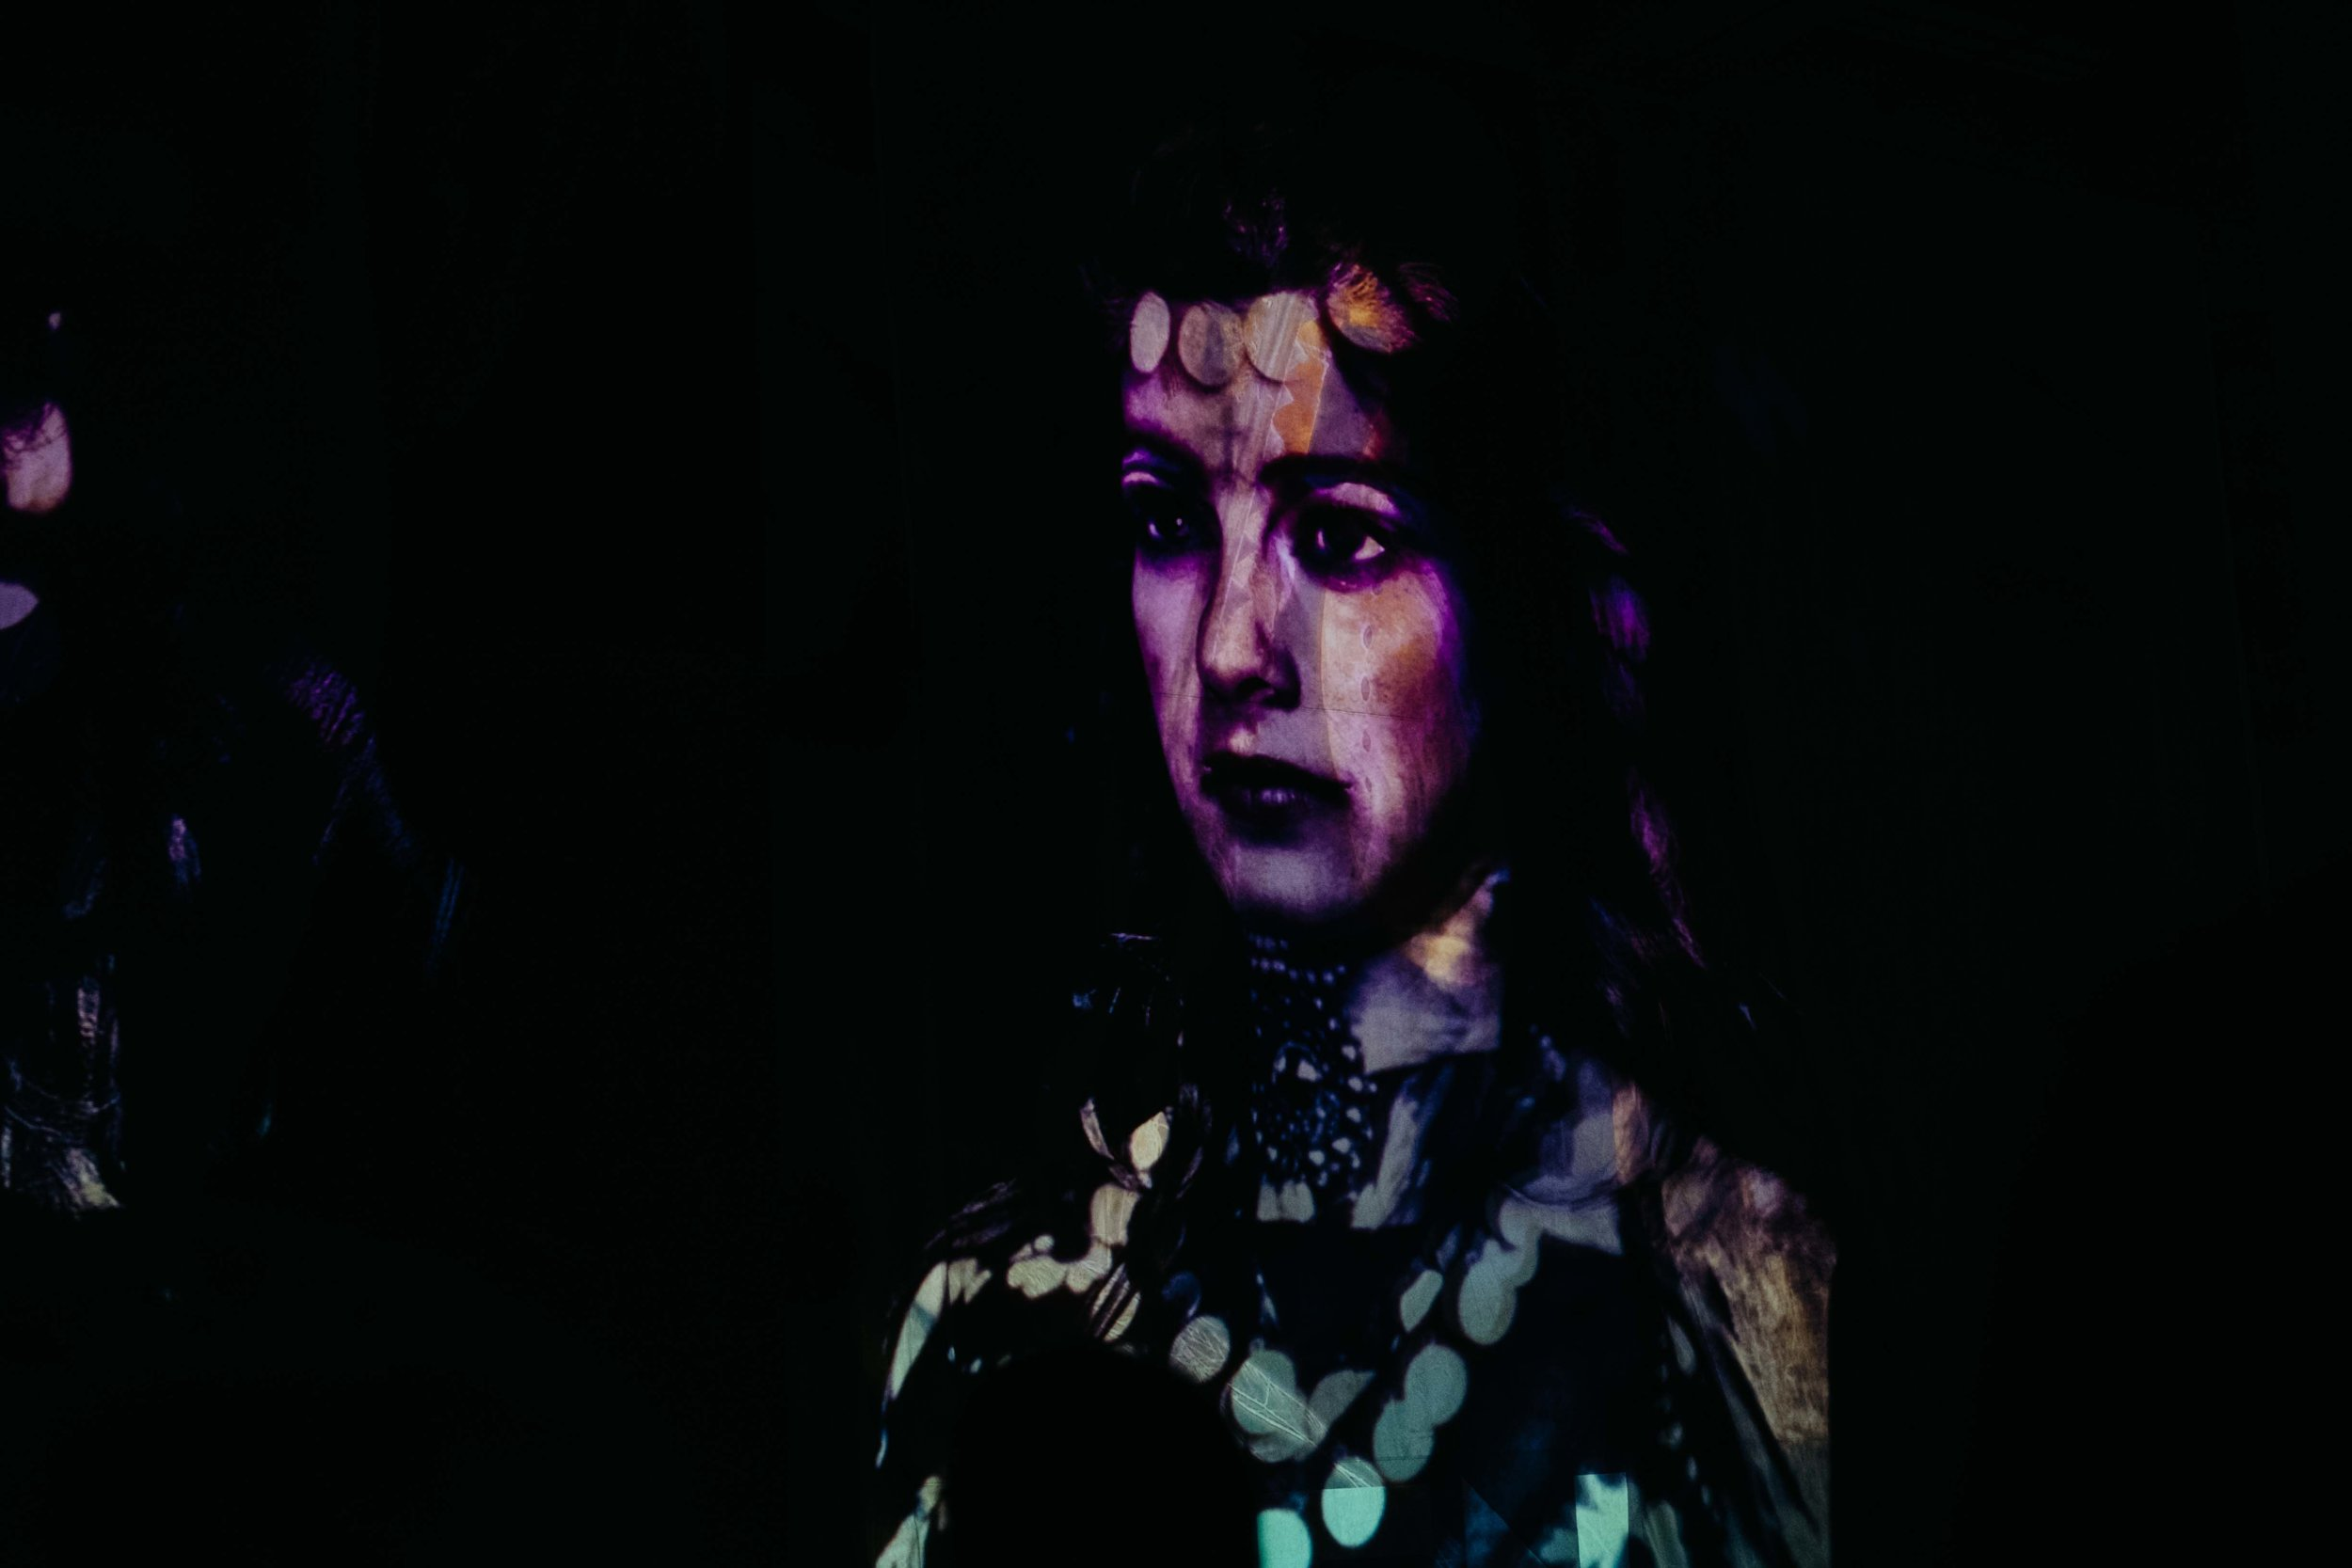 documenta14-kassel-kunst-wearecity-simonhariman-2017-19.jpg